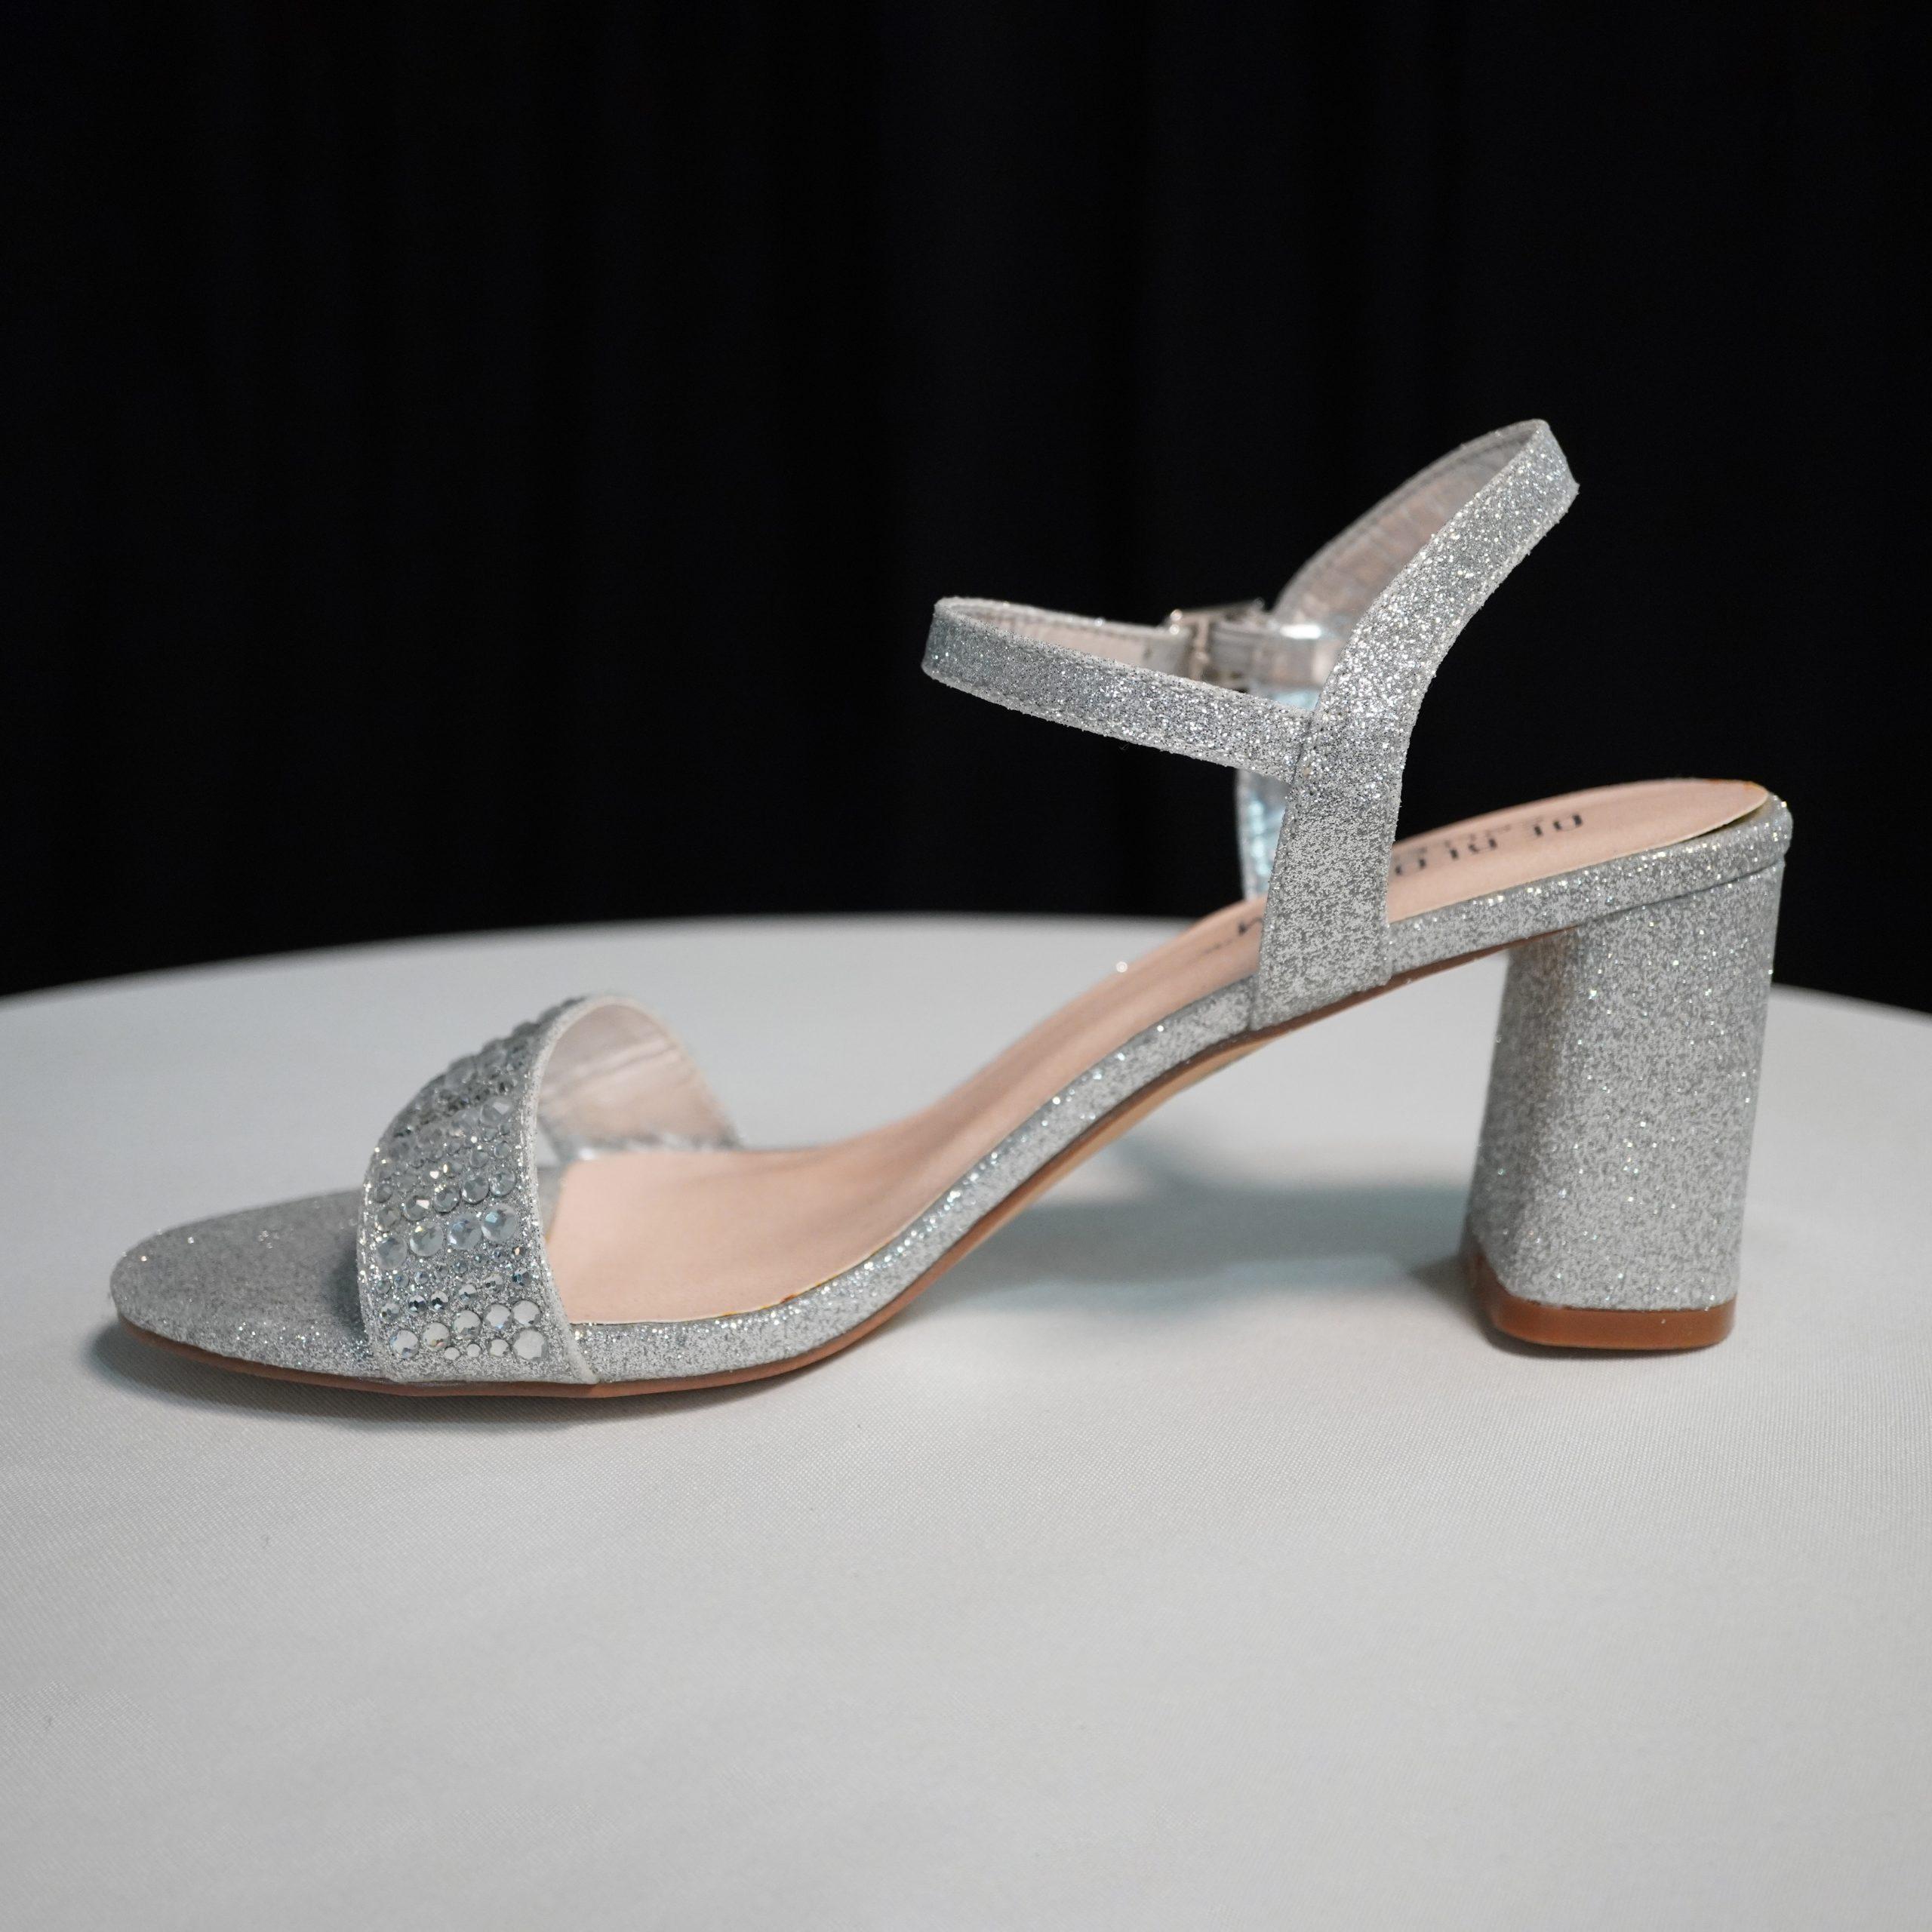 Shoe__3